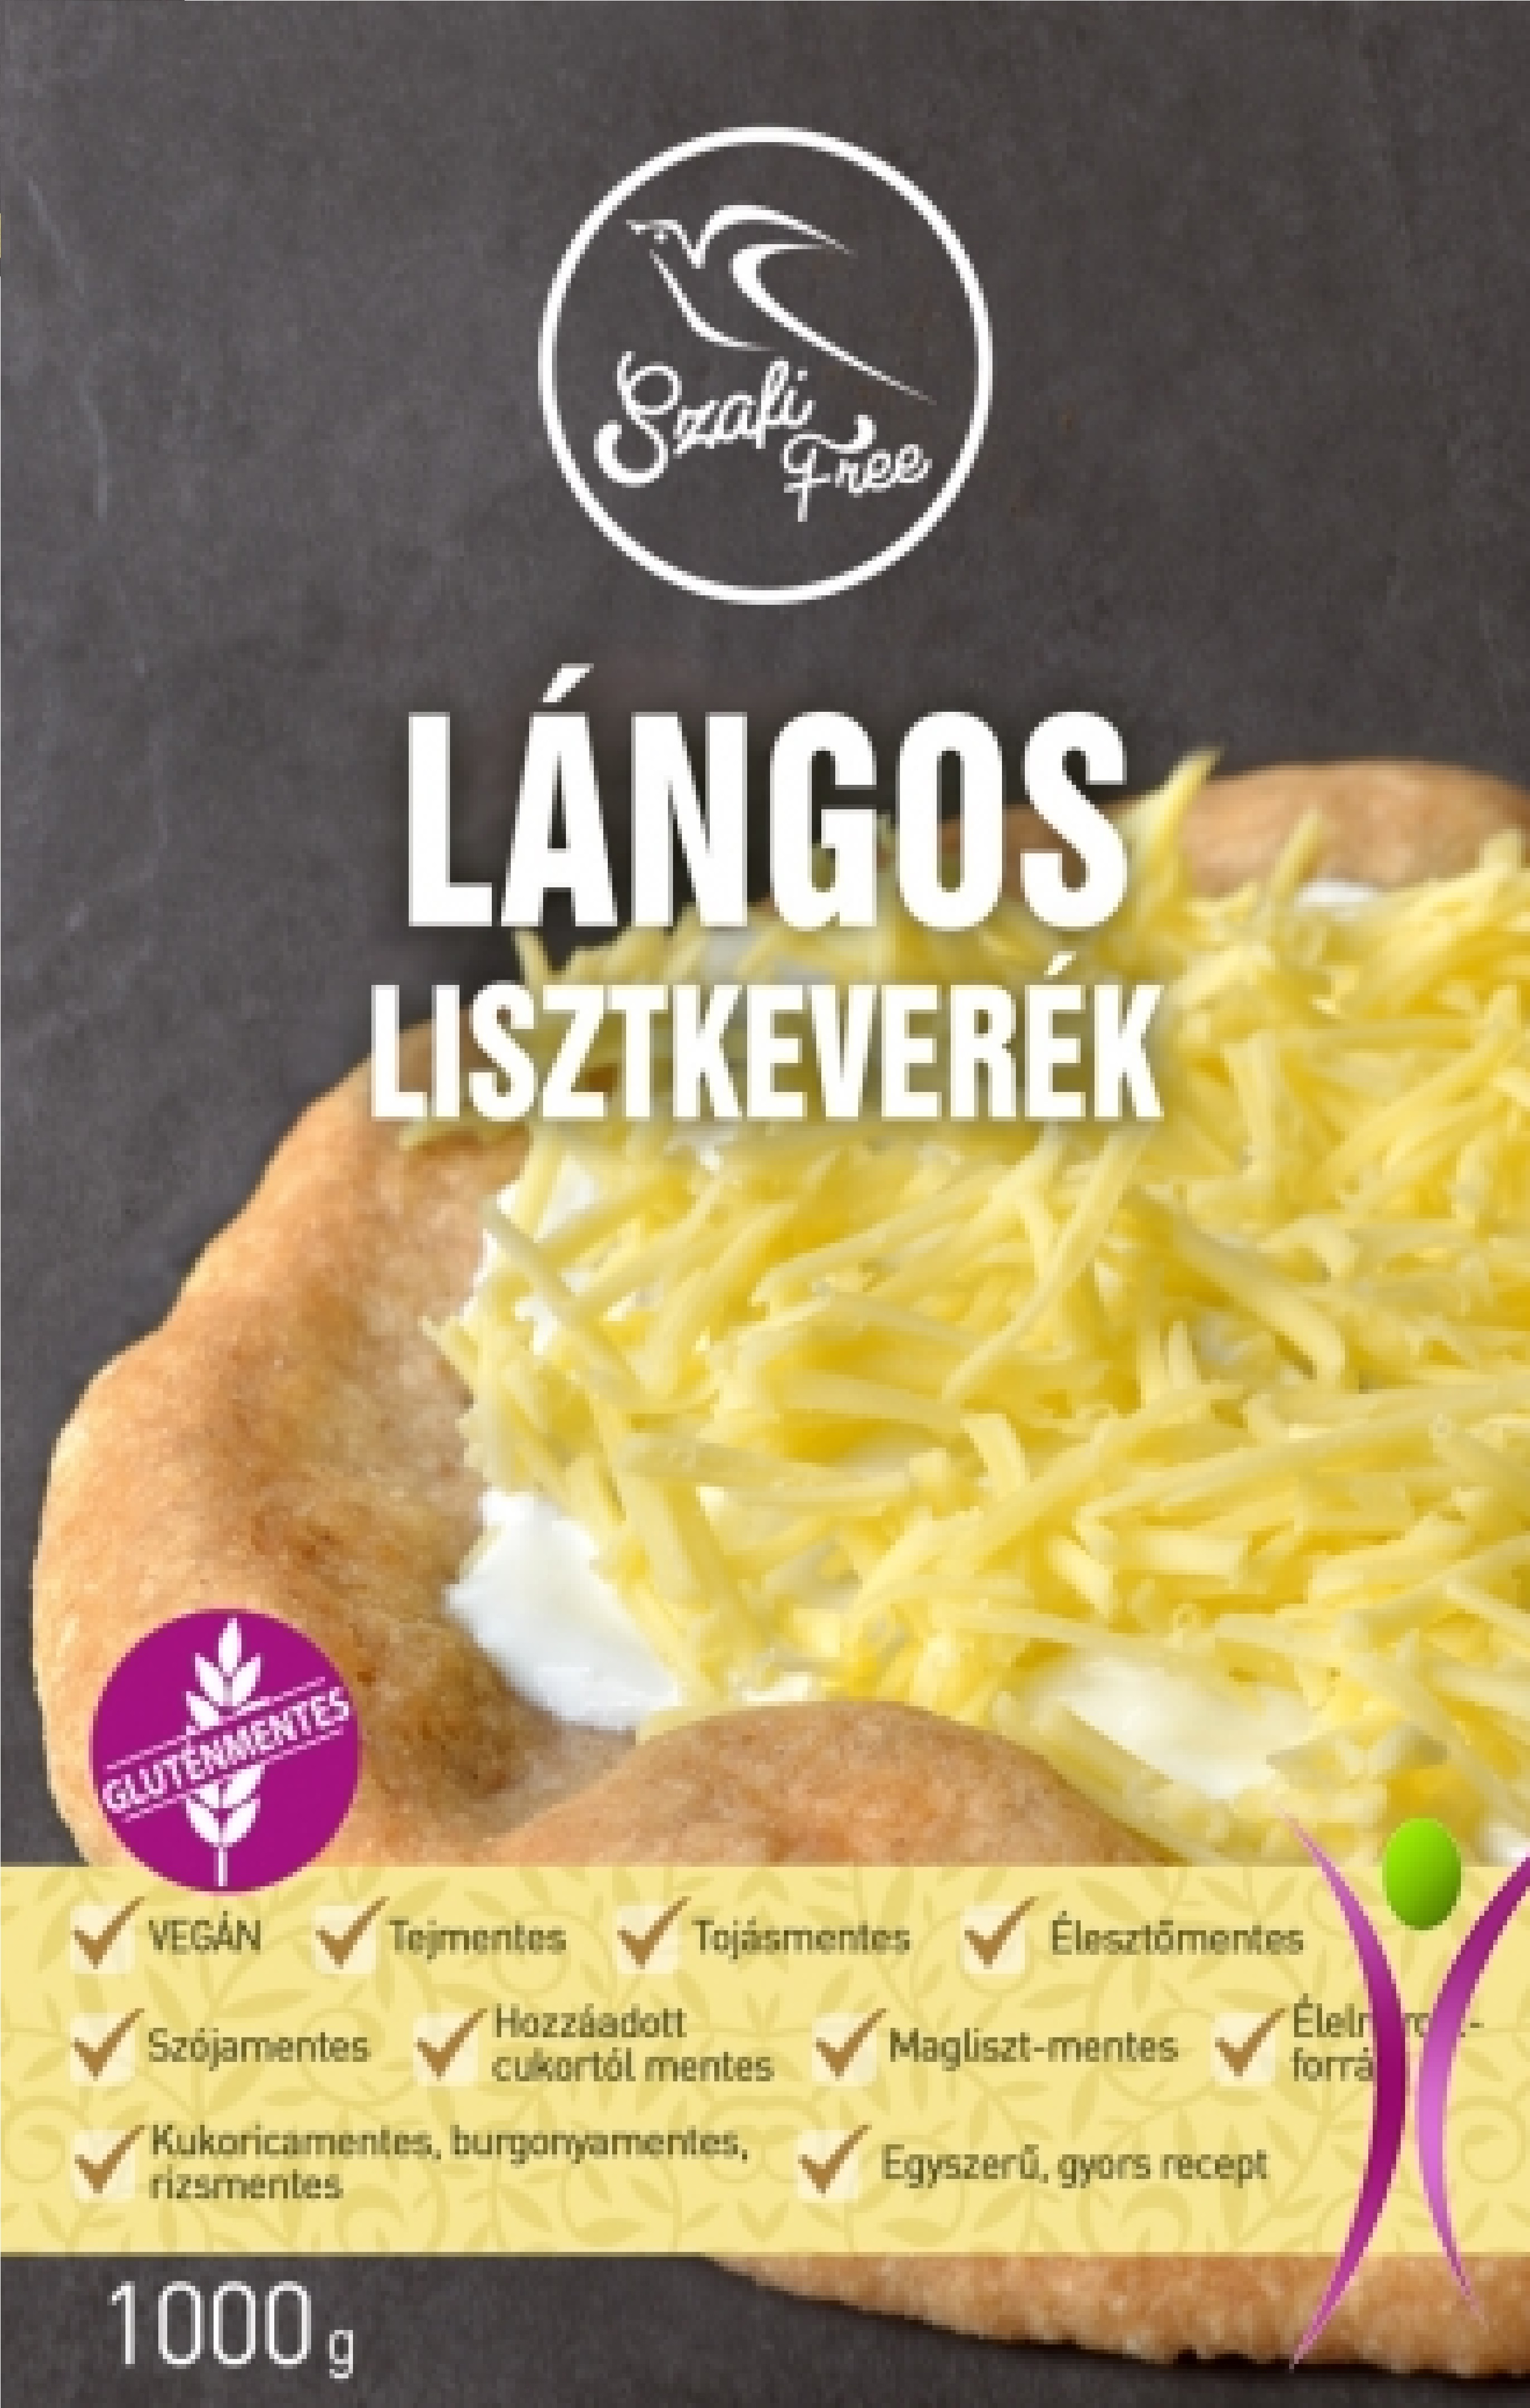 Szafi Free 'Langos' Mix 1 kg